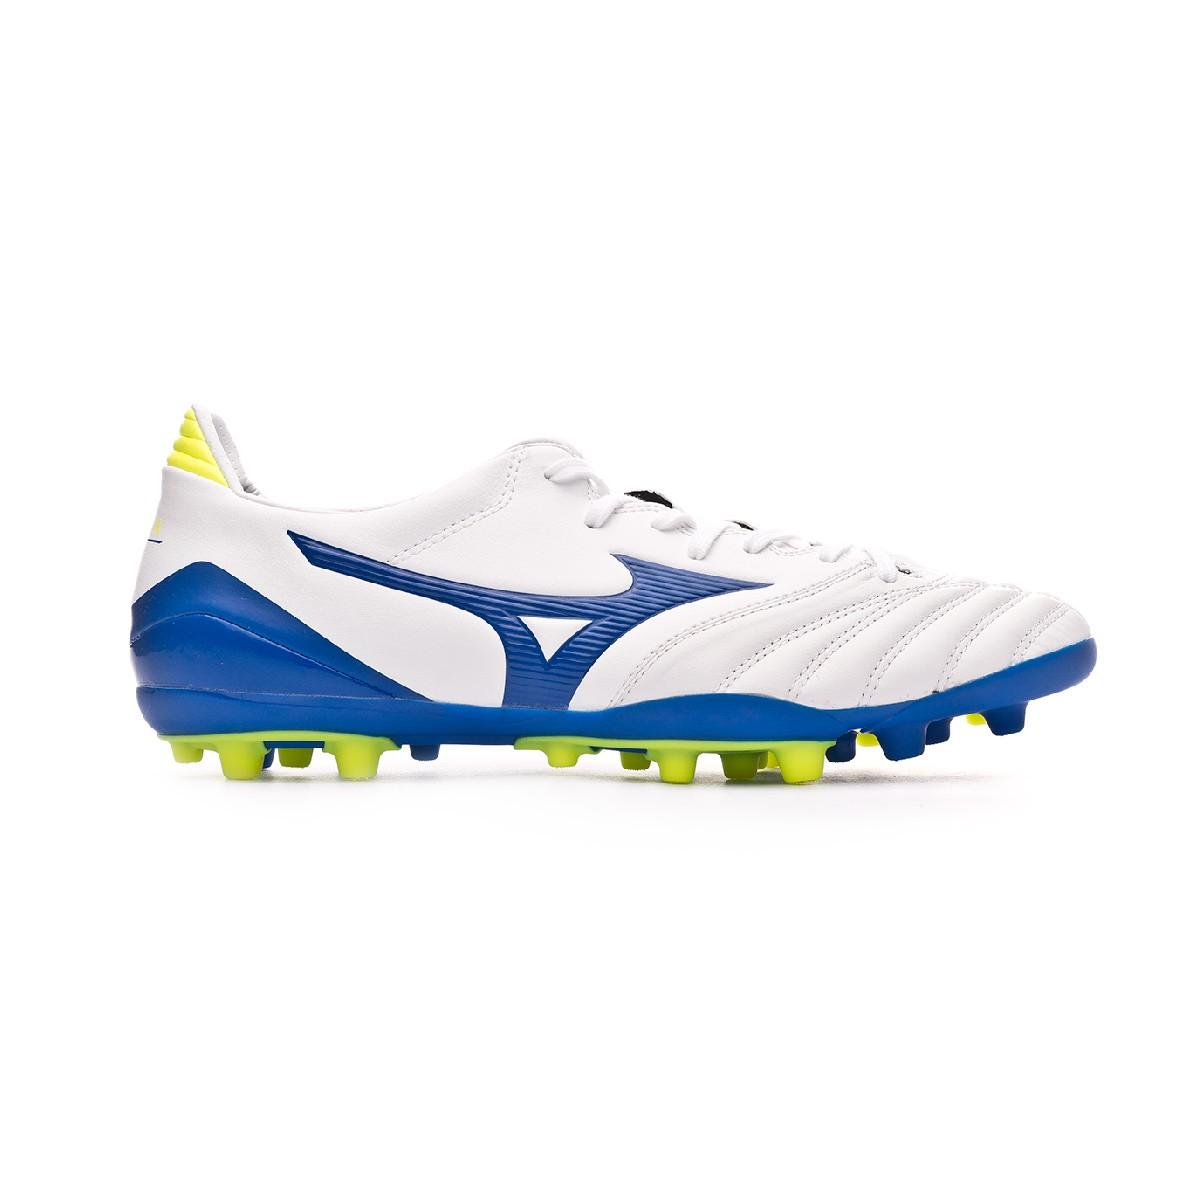 49882cc20bdd4 Football Boots Mizuno Morelia Neo KL II AG White-Wave cup blue-Safety  yellow - Tienda de fútbol Fútbol Emotion